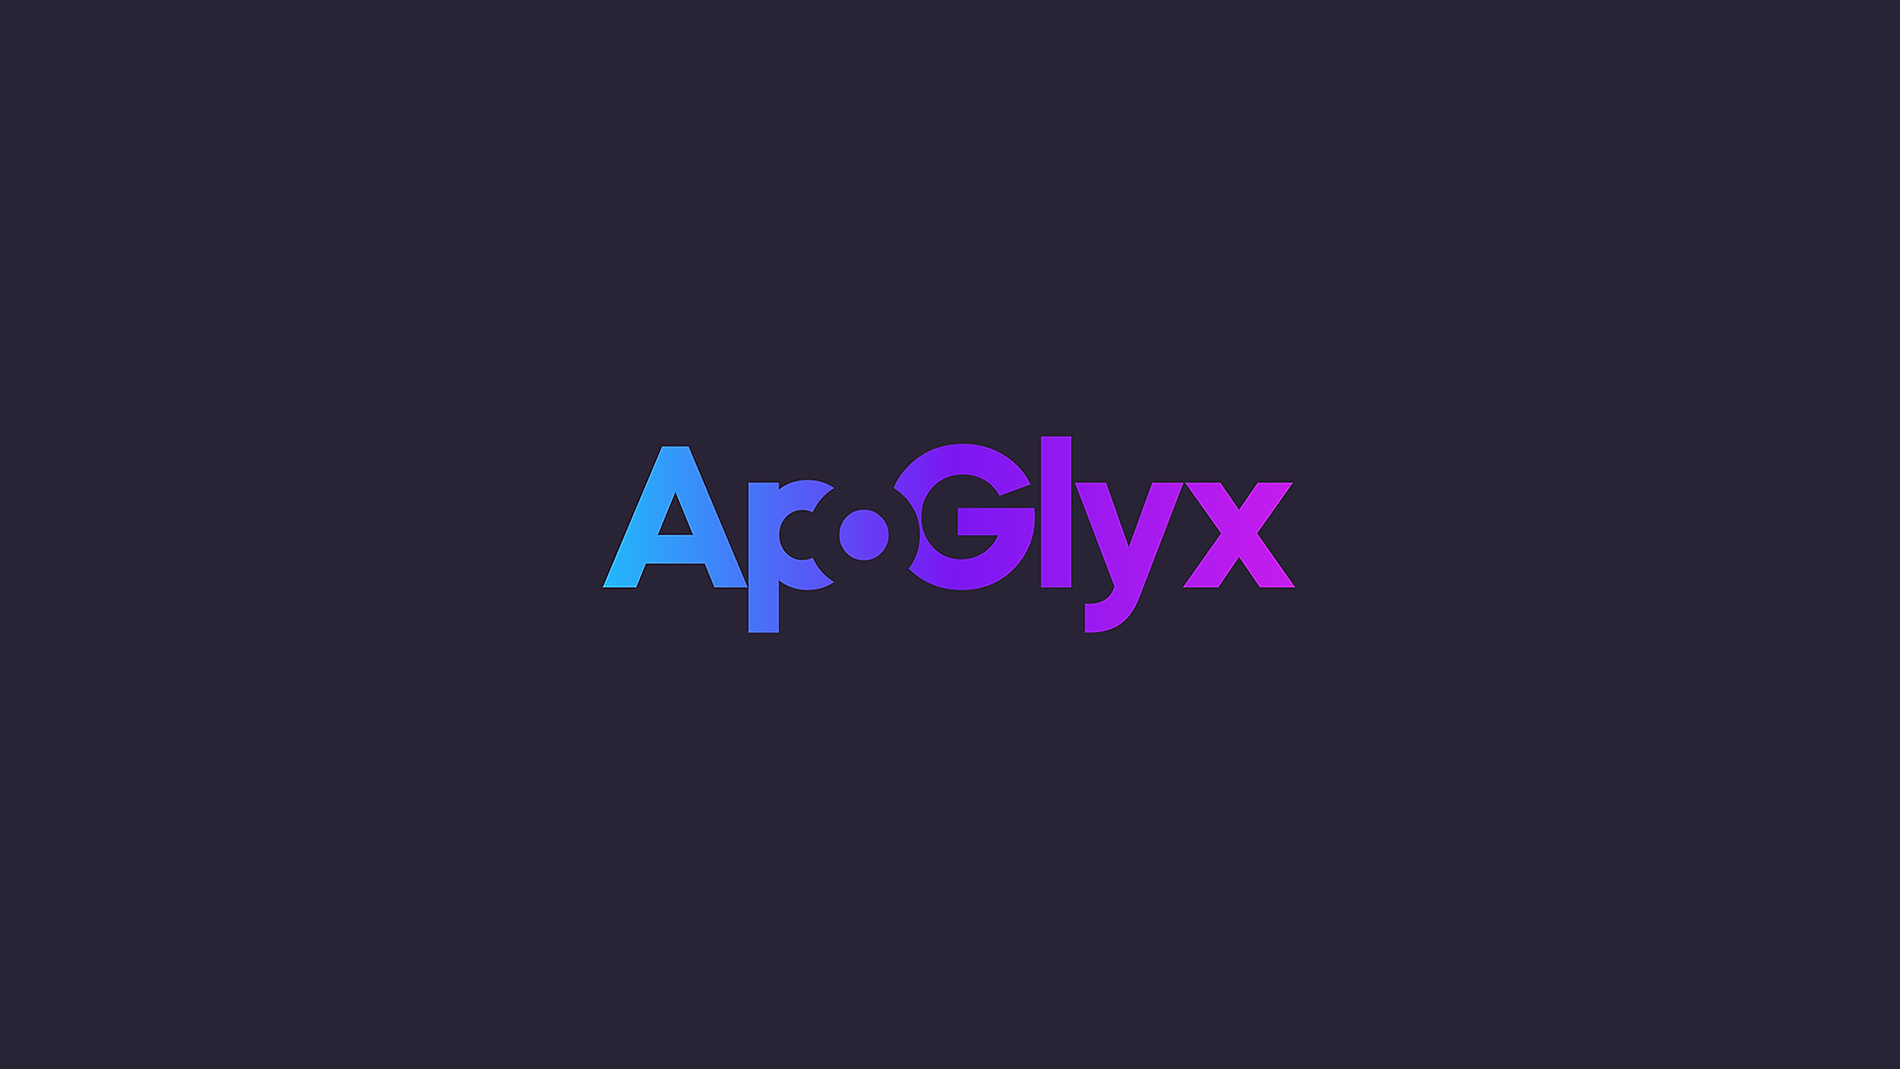 APOGLYX-2.png